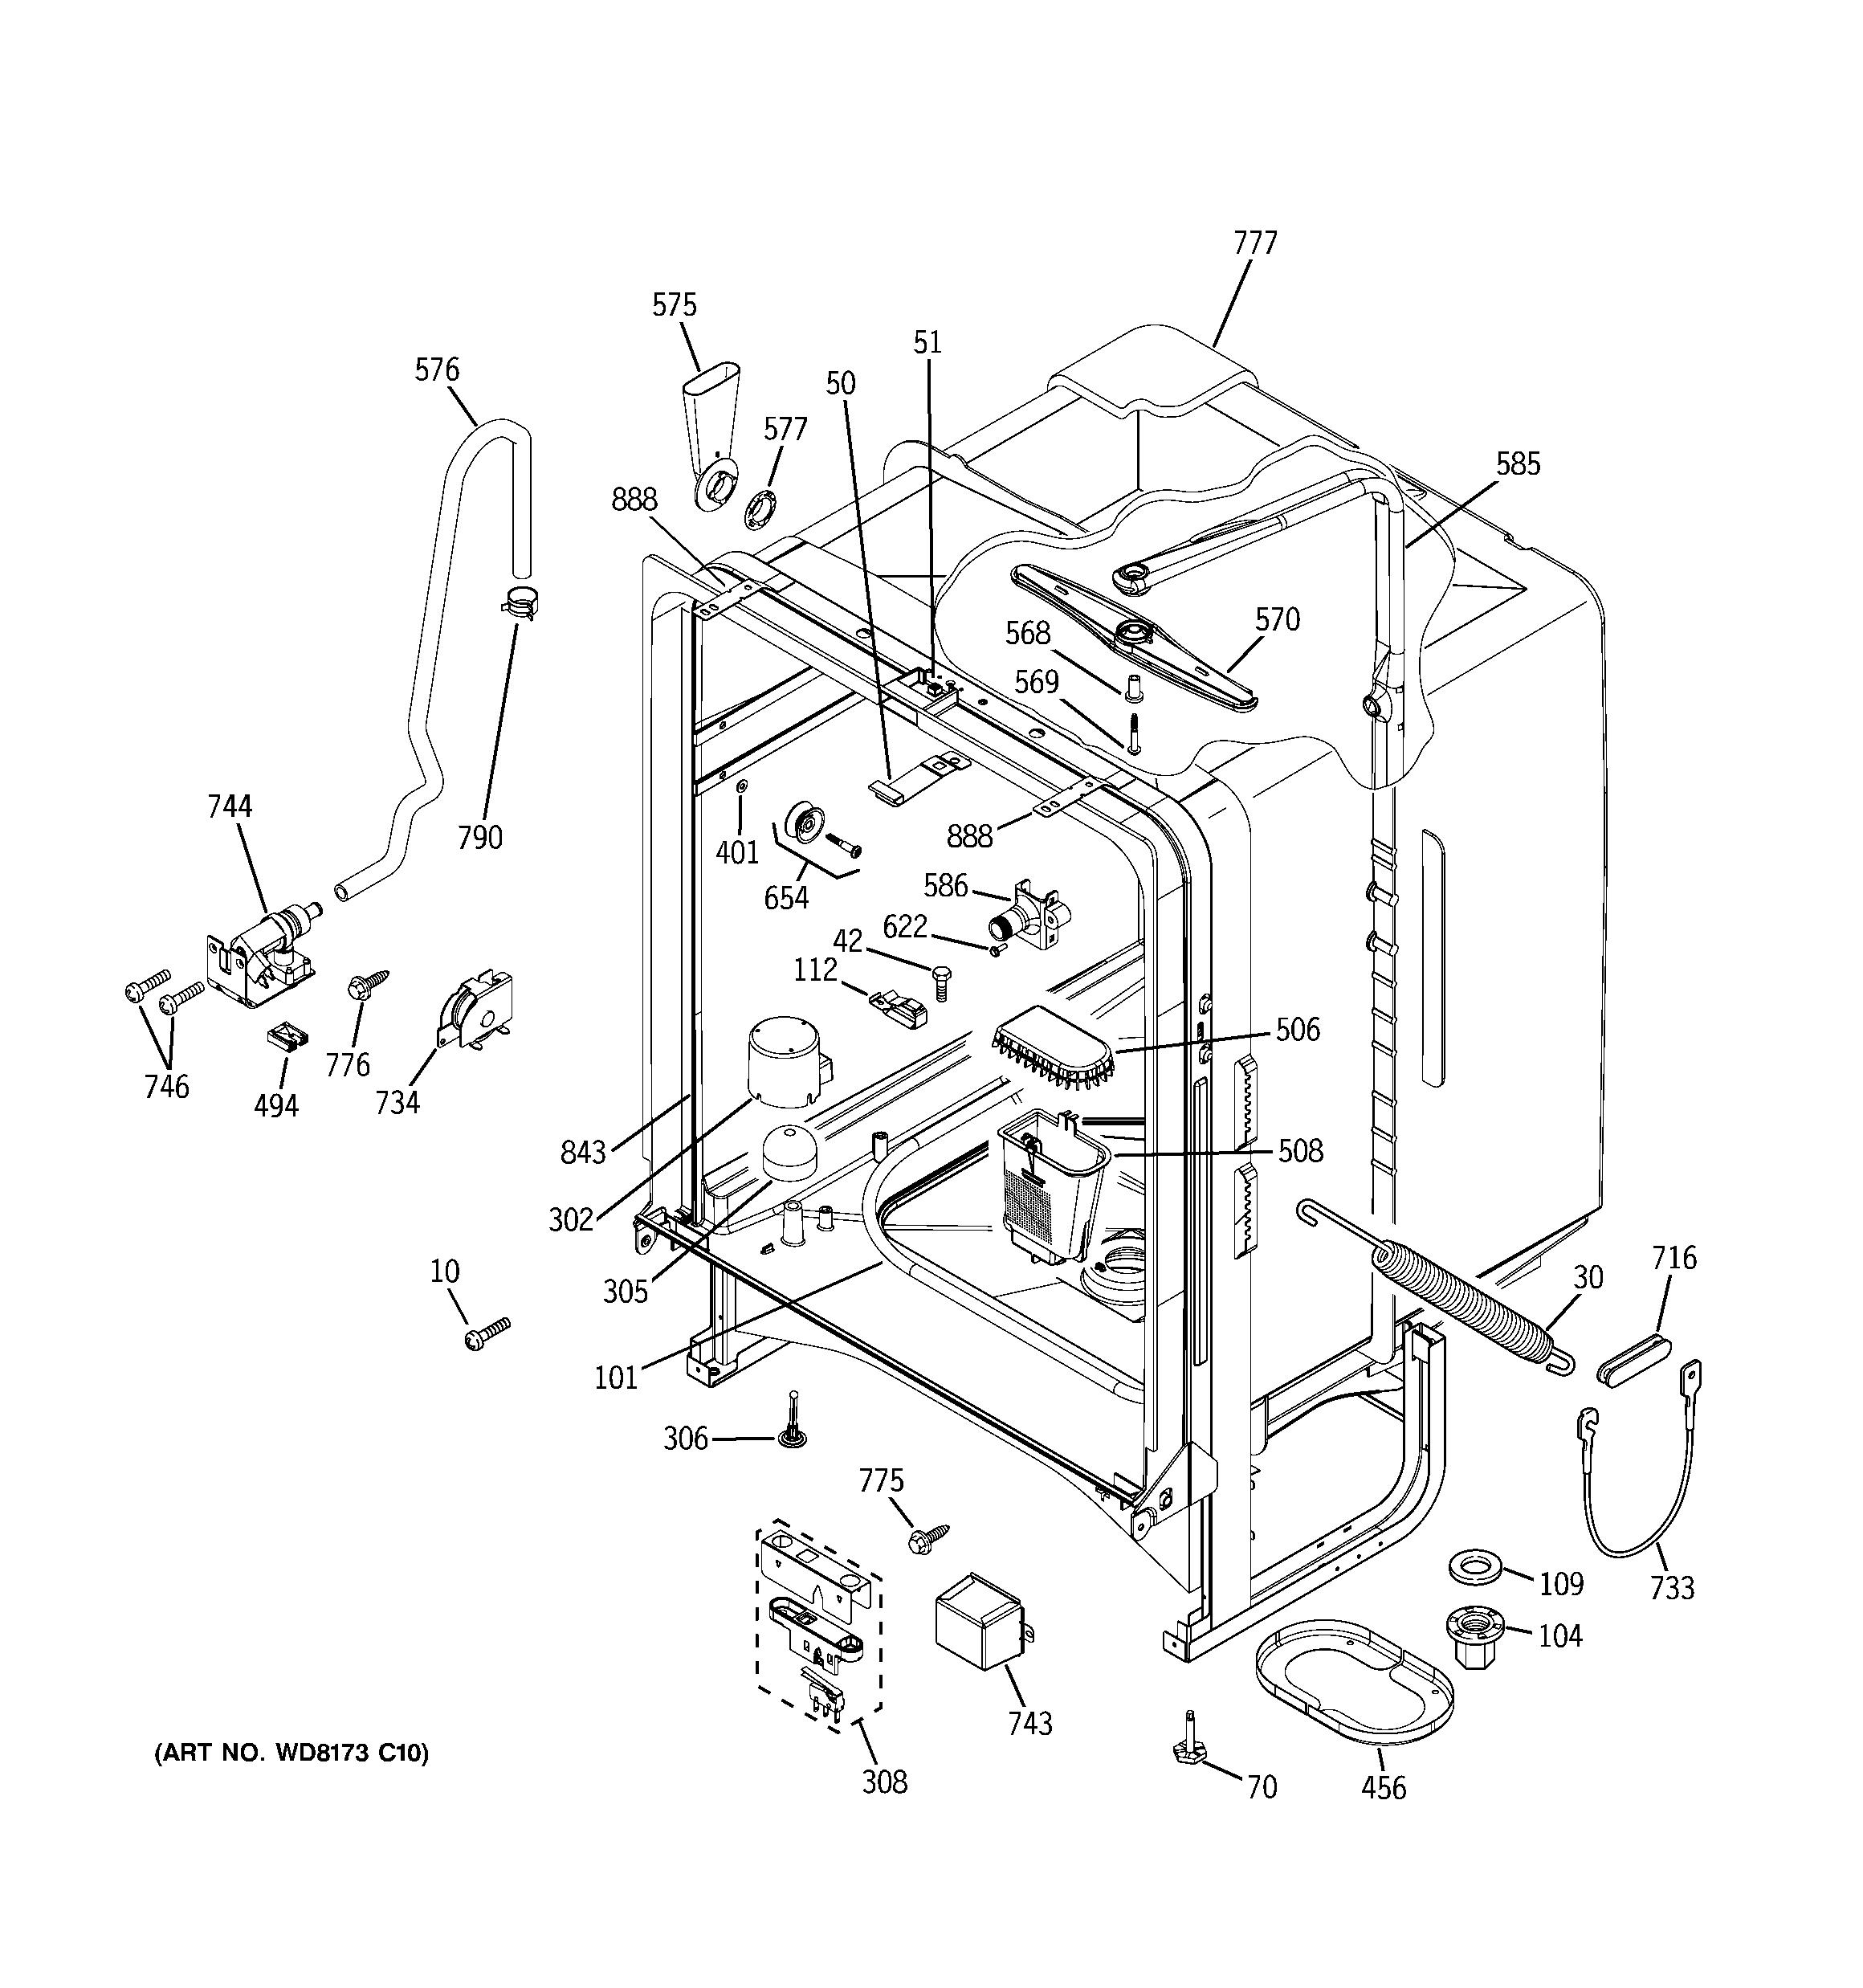 CT_2809] Ge Dishwasher Wiring Diagrams On Ge Profile Range Parts DiagramBrece Ivoro Expe Iness Hendil Mohammedshrine Librar Wiring 101